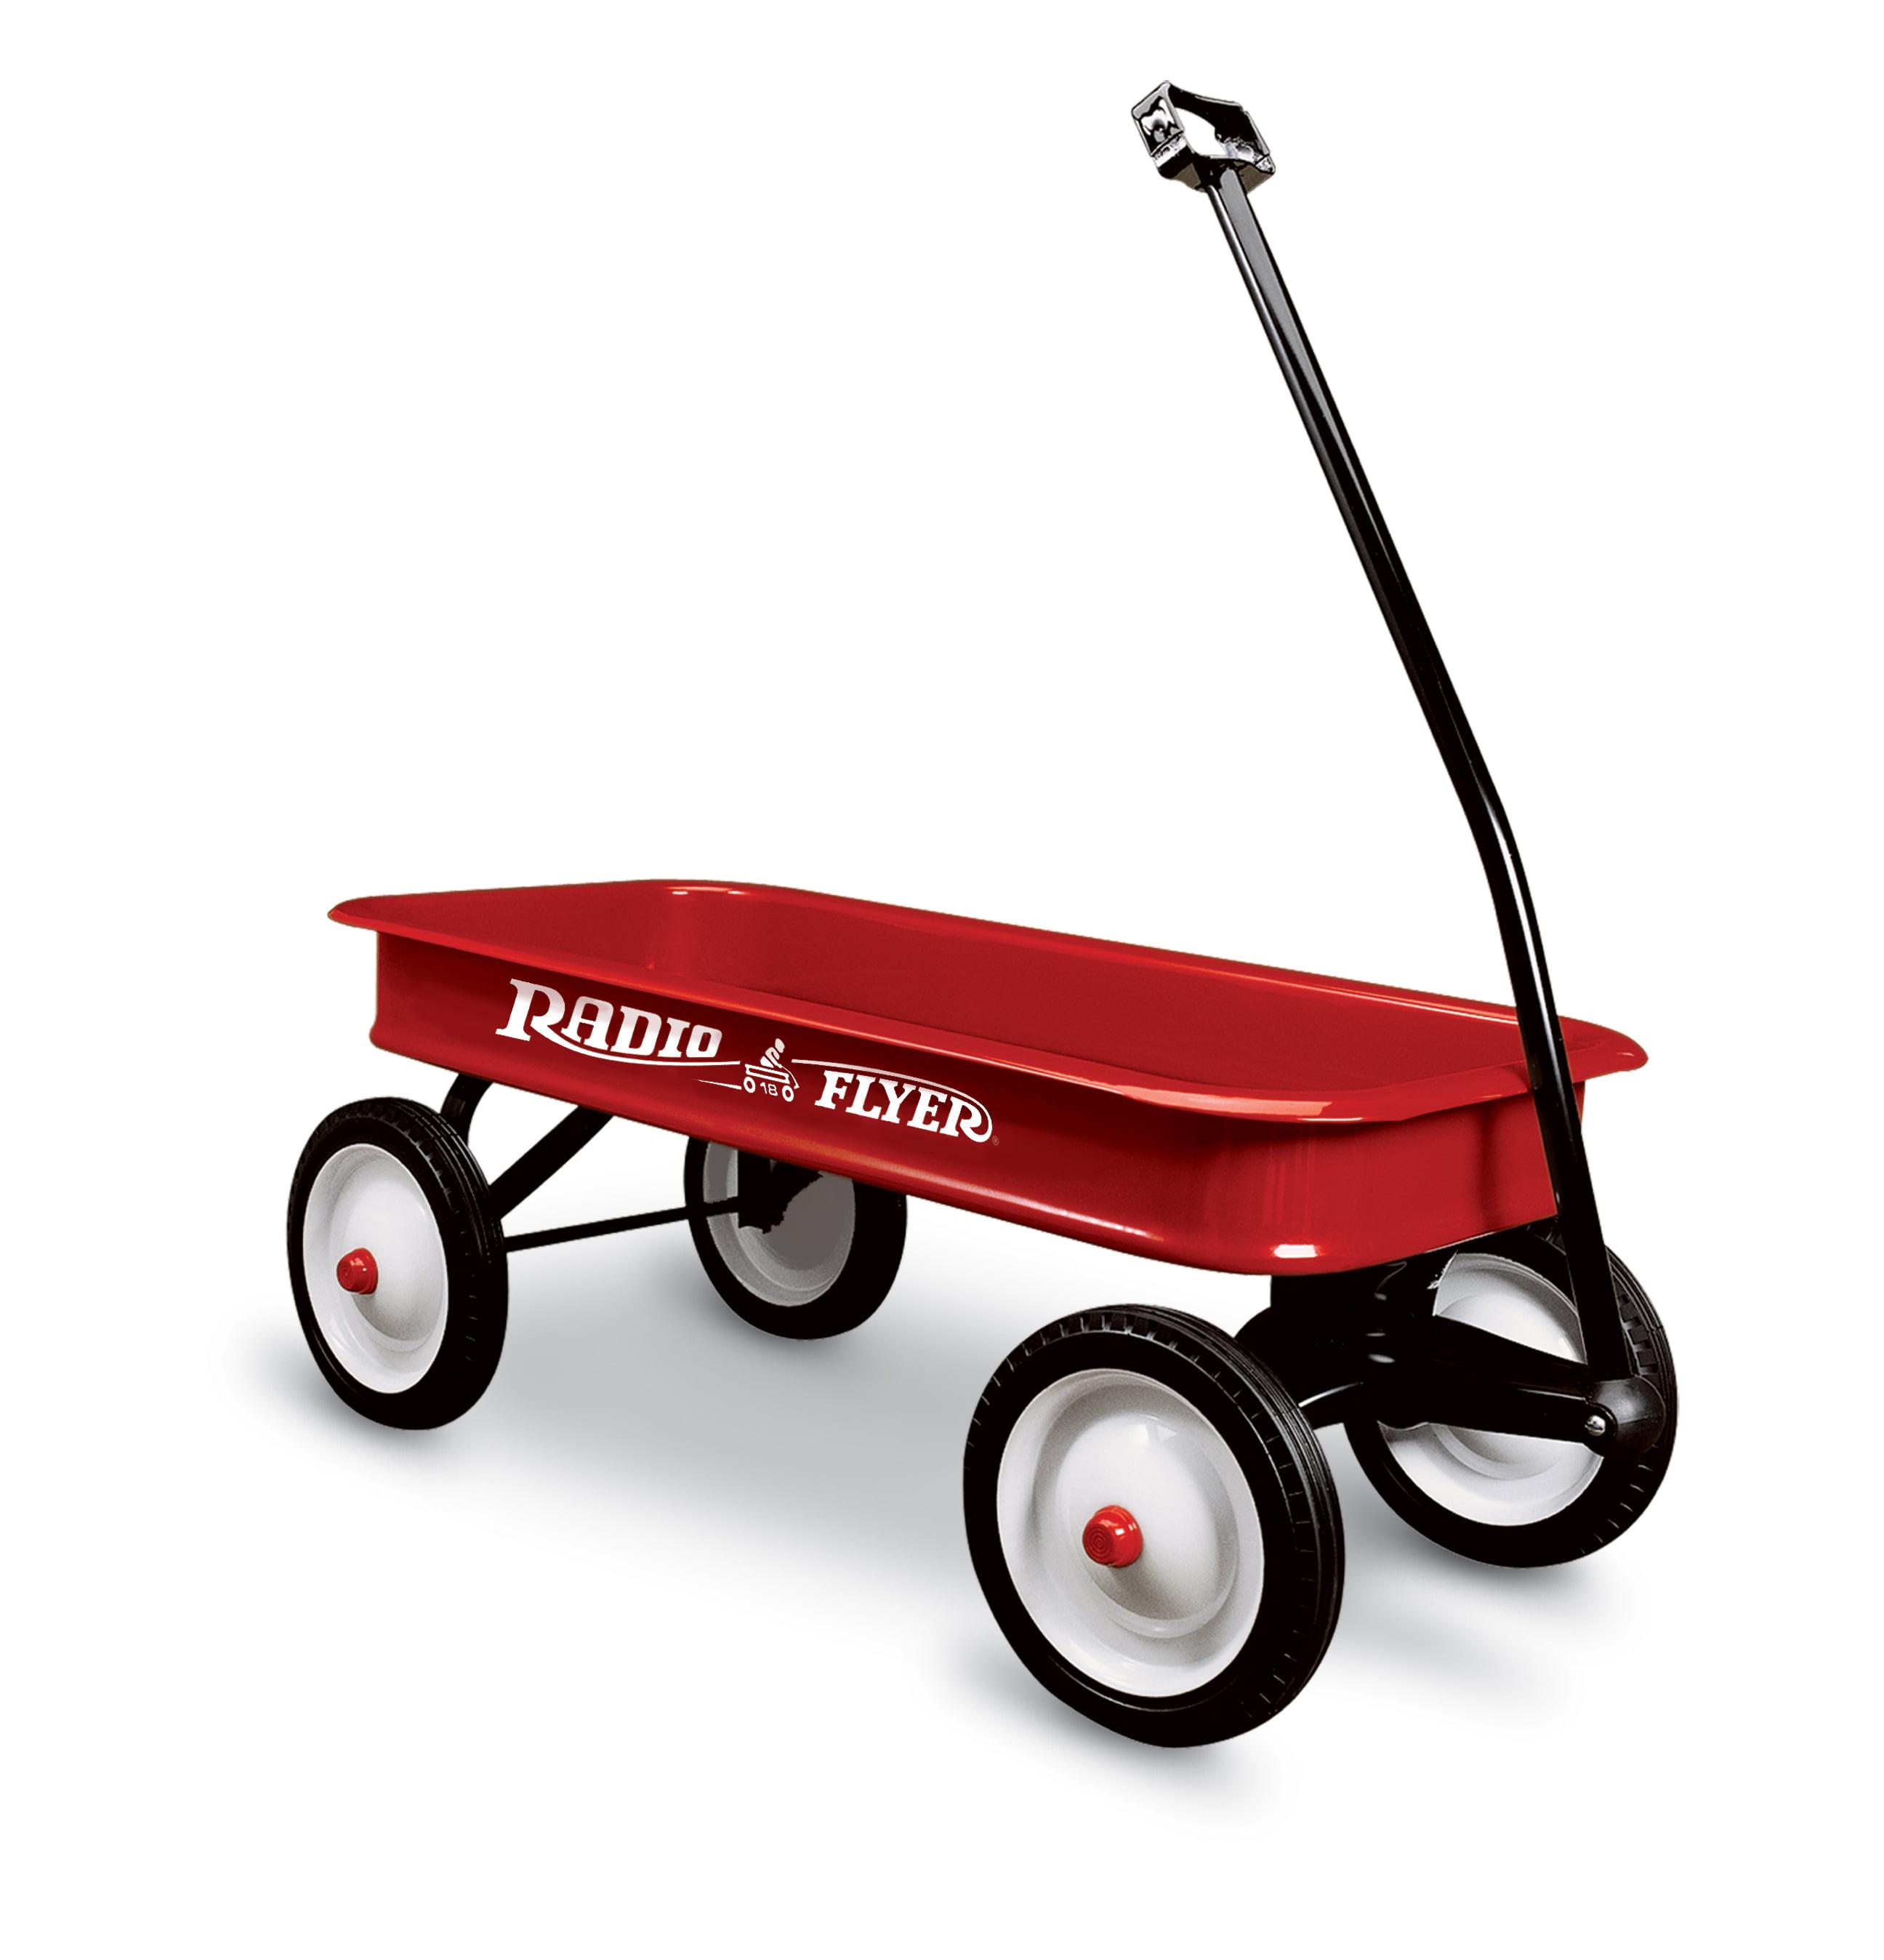 Radio Flyer, Original Classic Red Wagon, Model #18, Red by Radio Flyer Inc